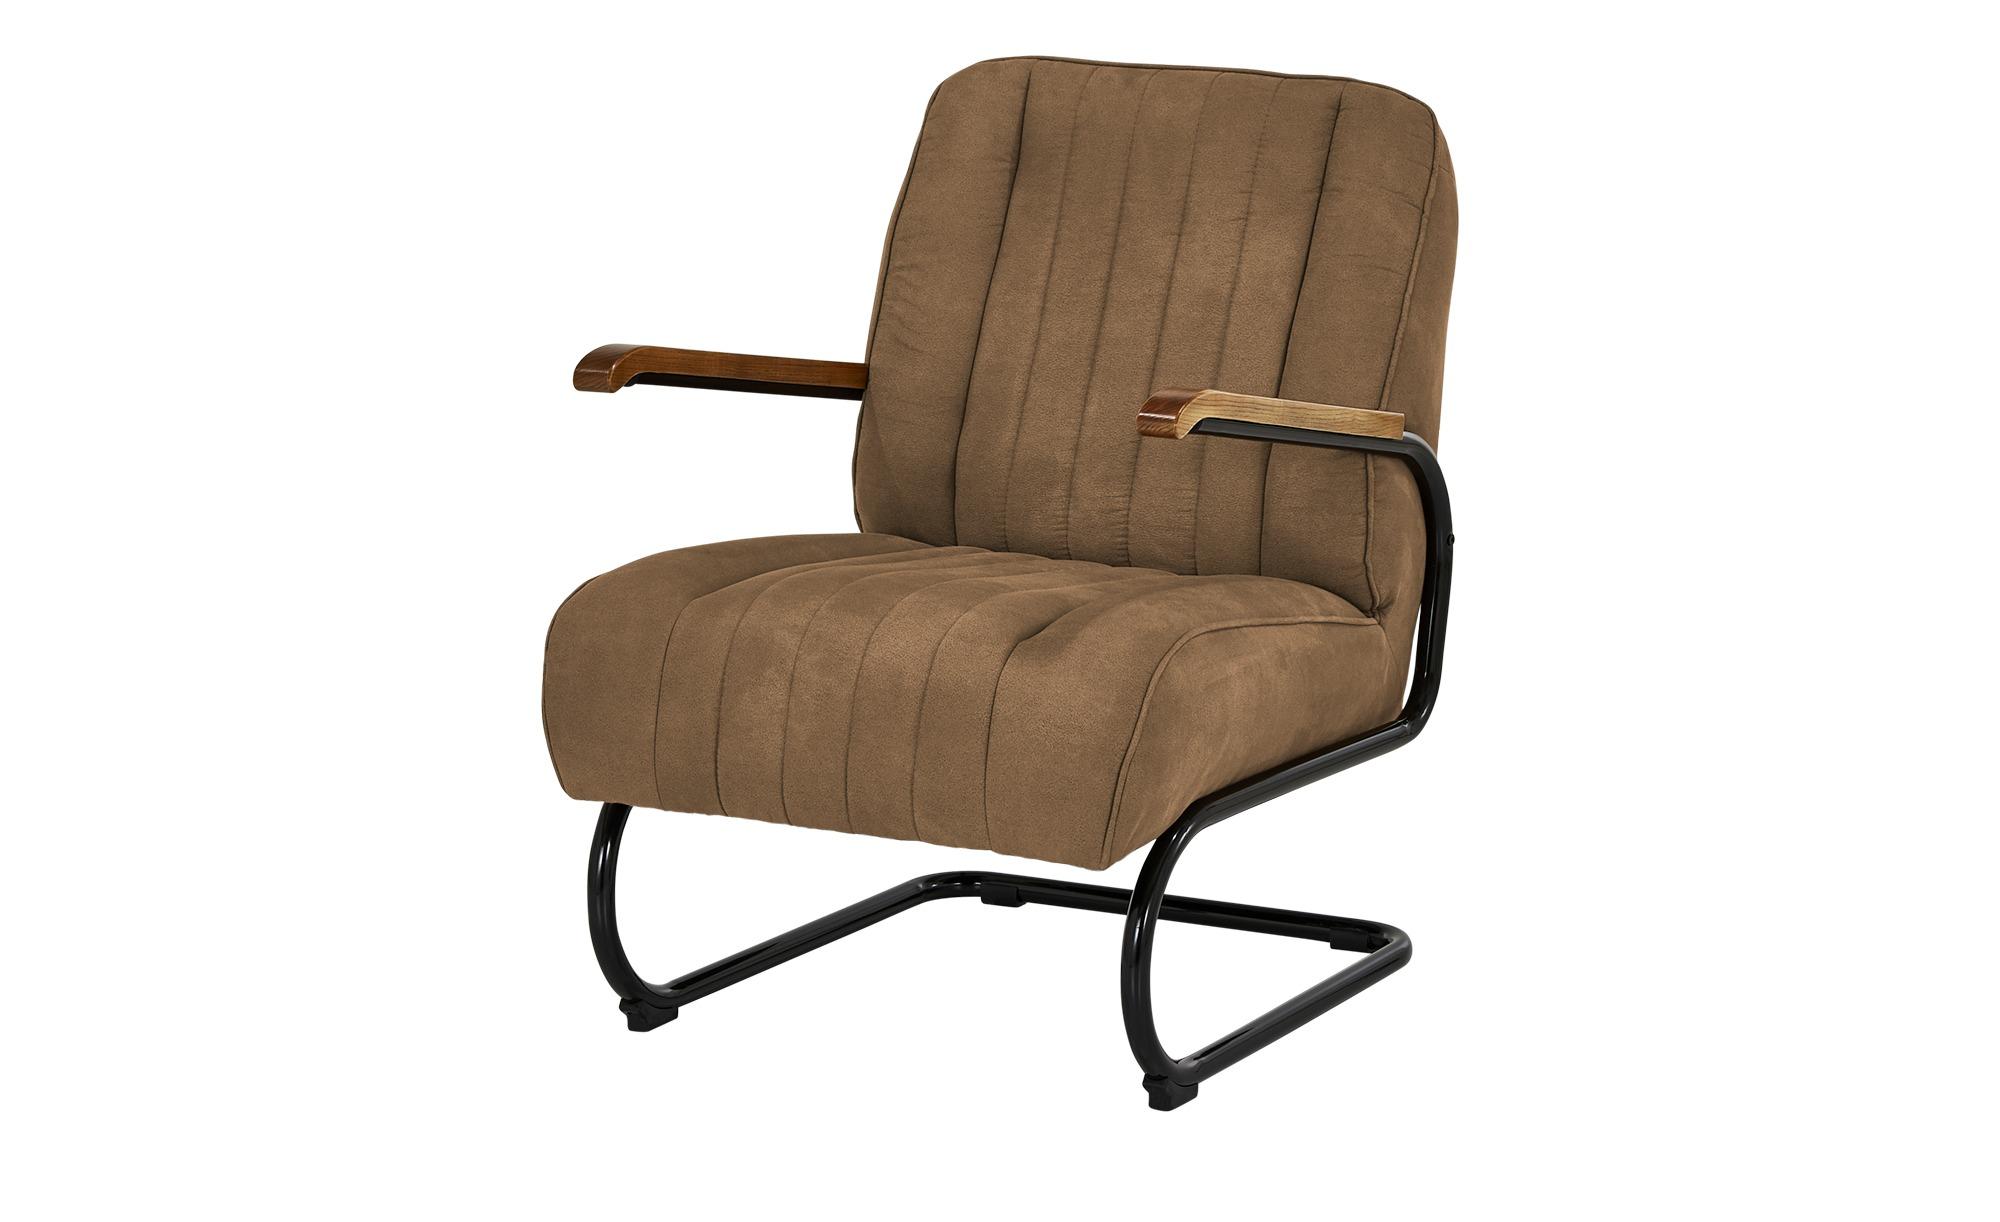 Sessel  Rachel ¦ braun ¦ Maße (cm): B: 67 H: 100 T: 83 Polstermöbel > Sessel > Polstersessel - Höffner